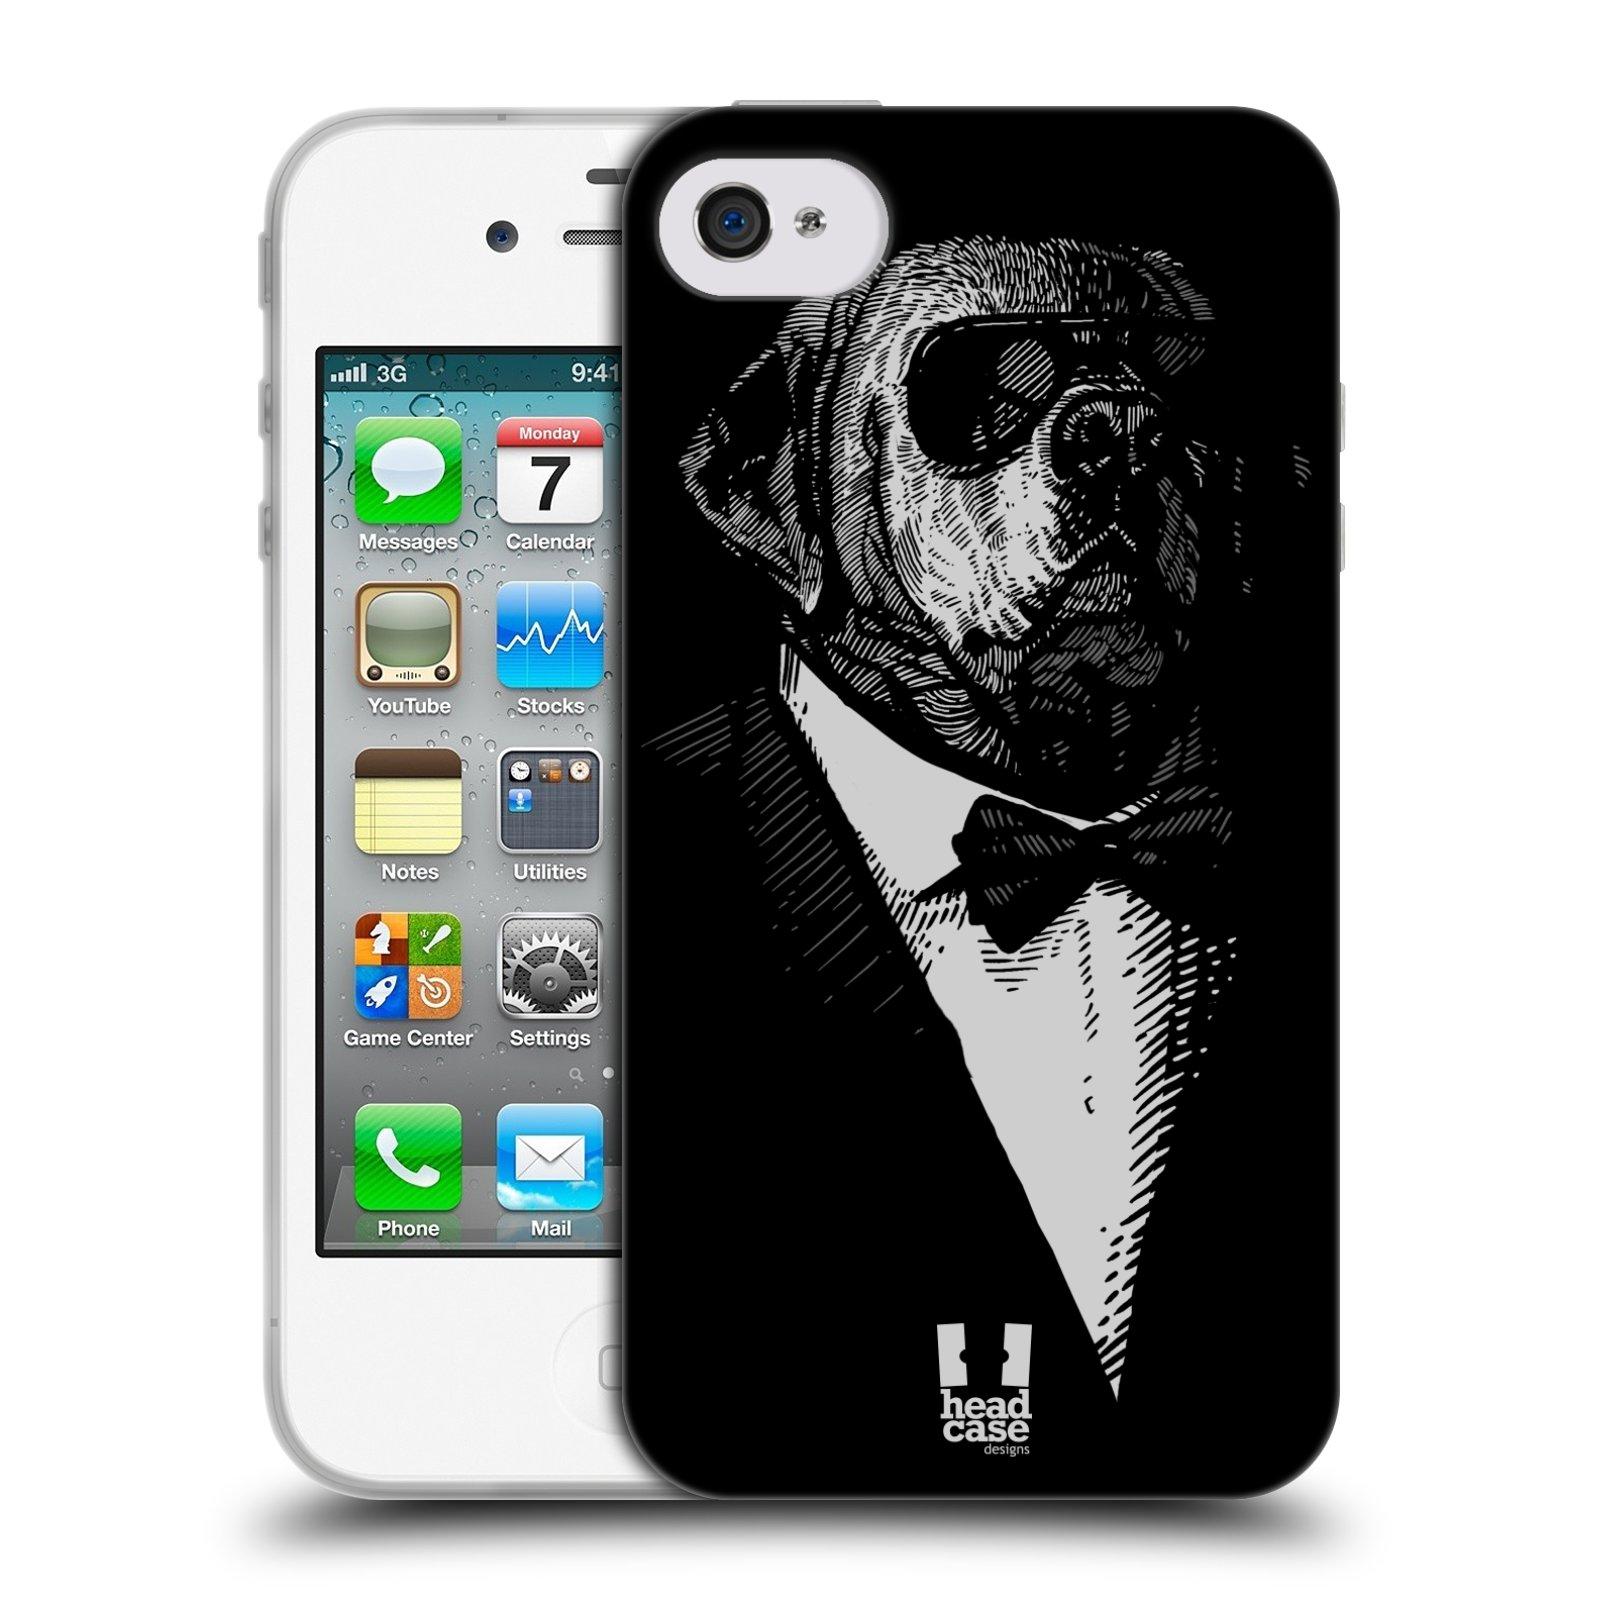 HEAD CASE silikonový obal na mobil Apple Iphone 4/4S vzor Zvíře v obleku pes